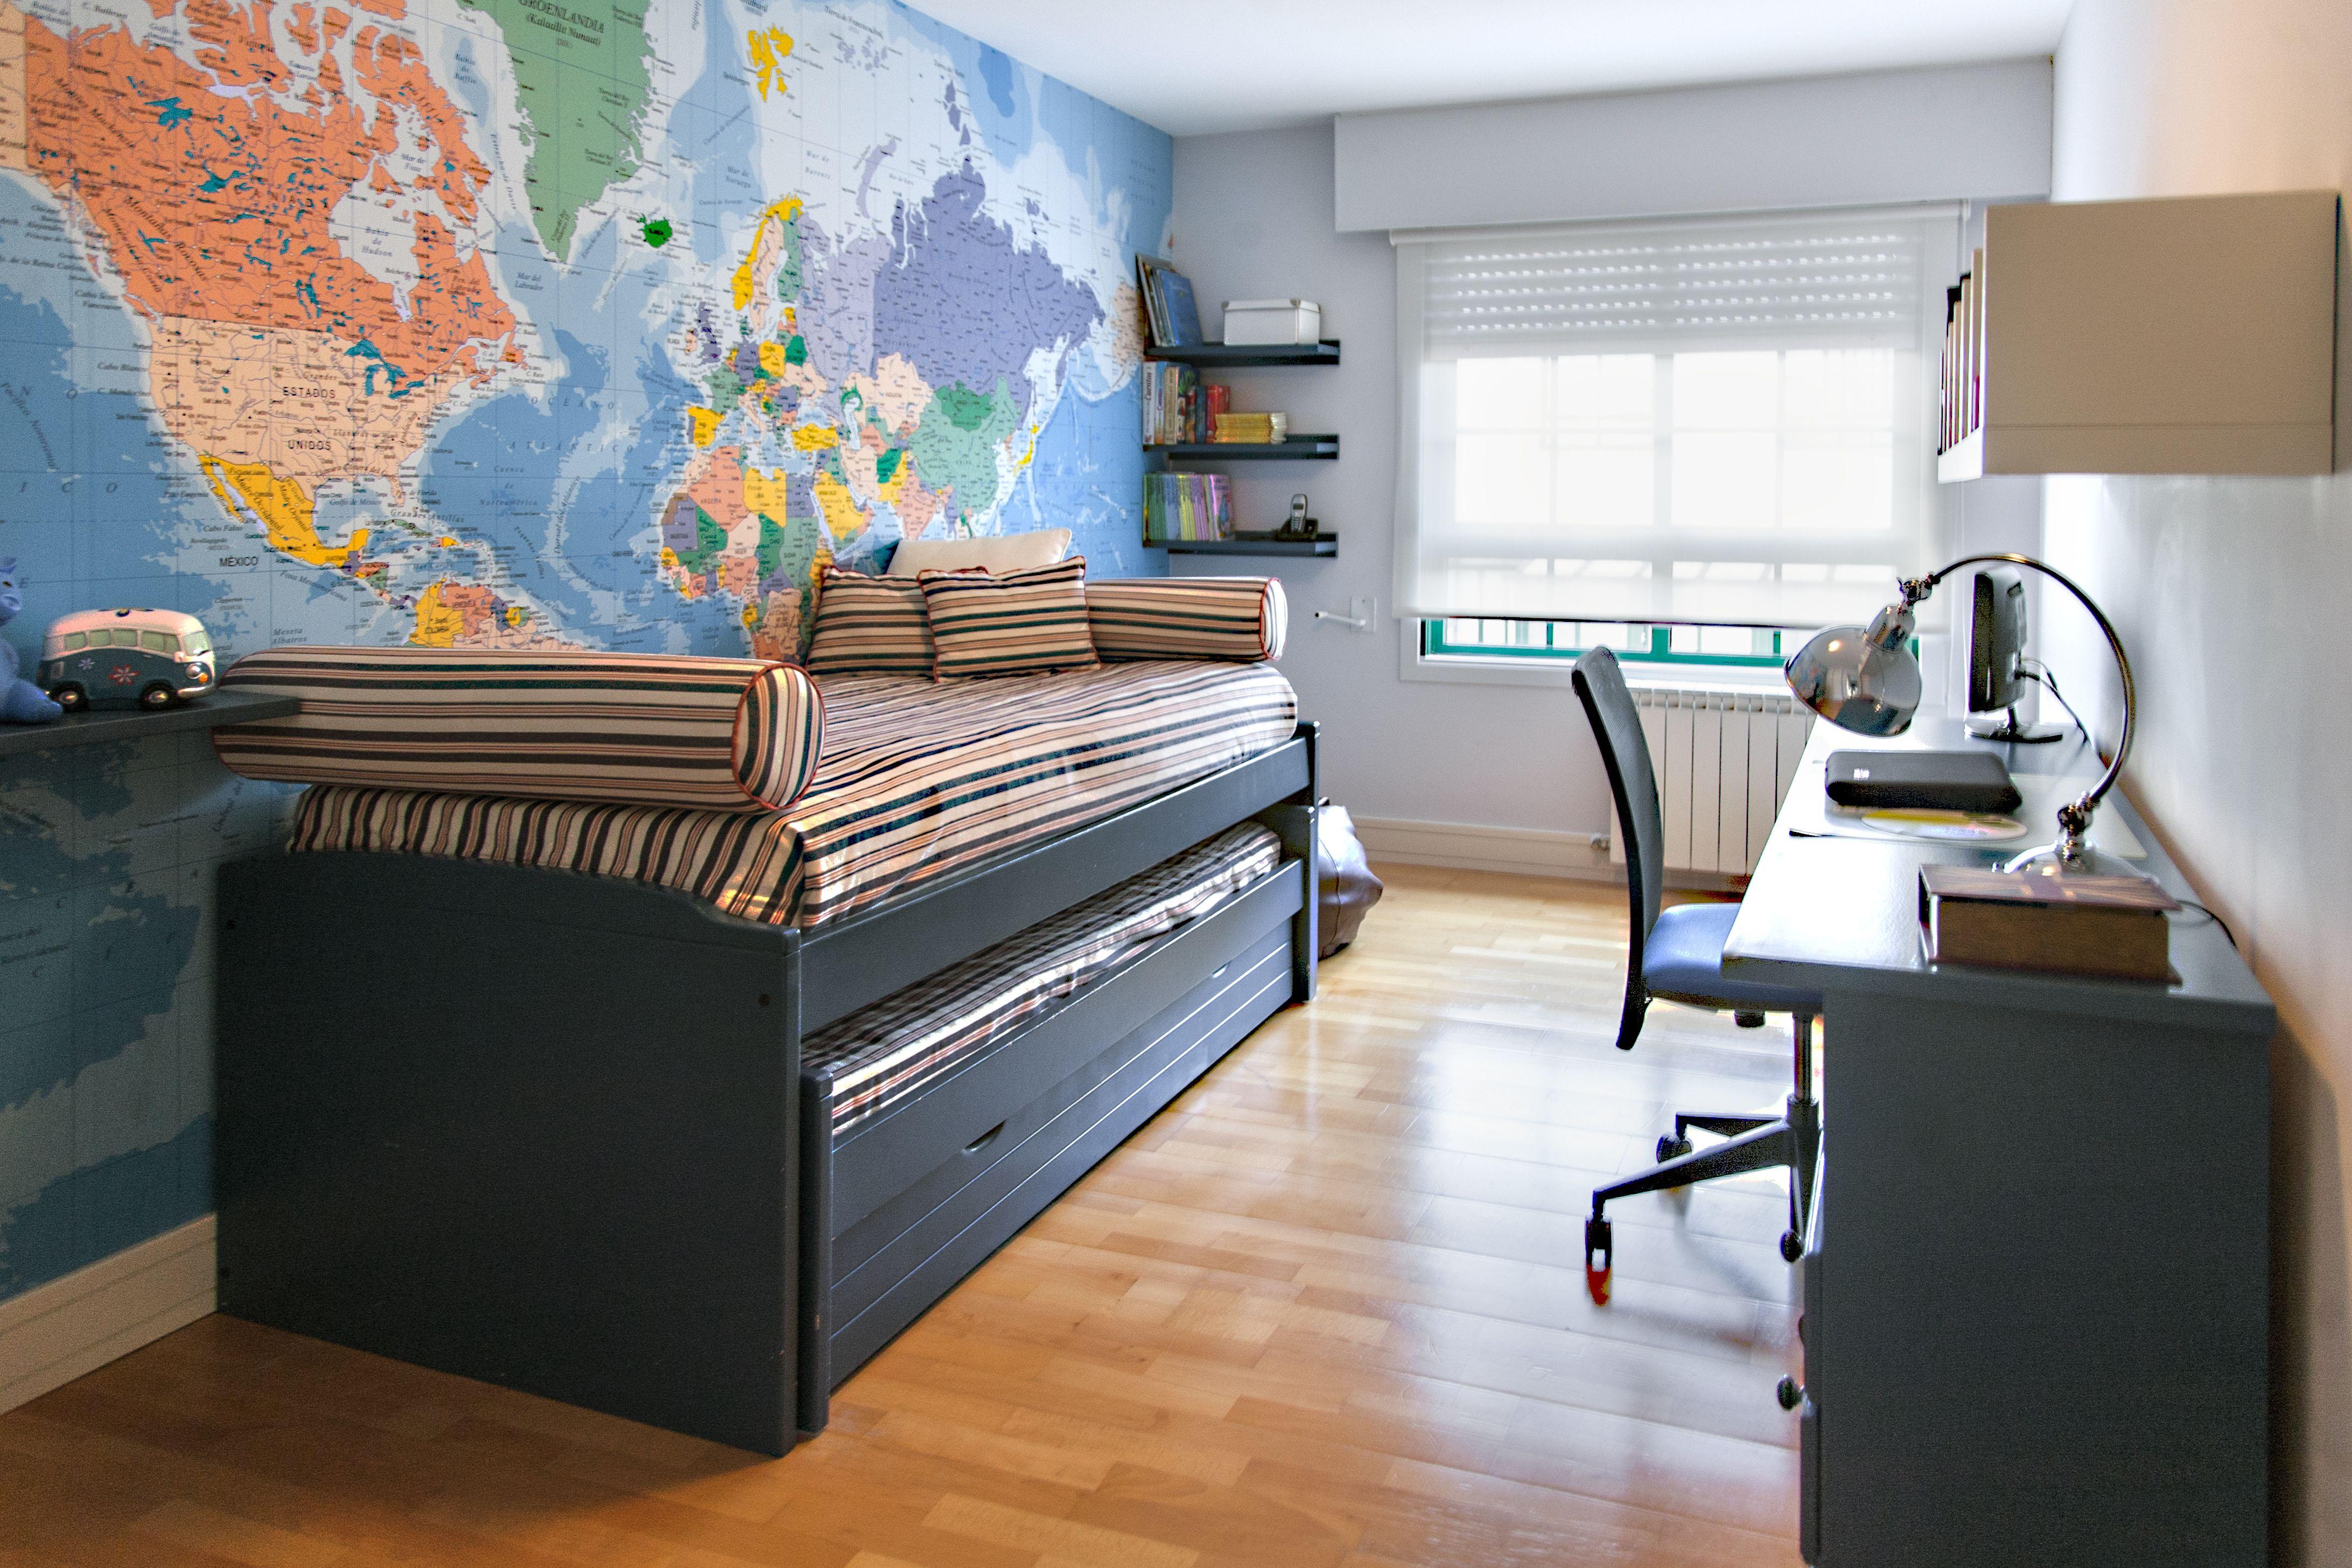 Dormitorio infantil // Child's bedroom